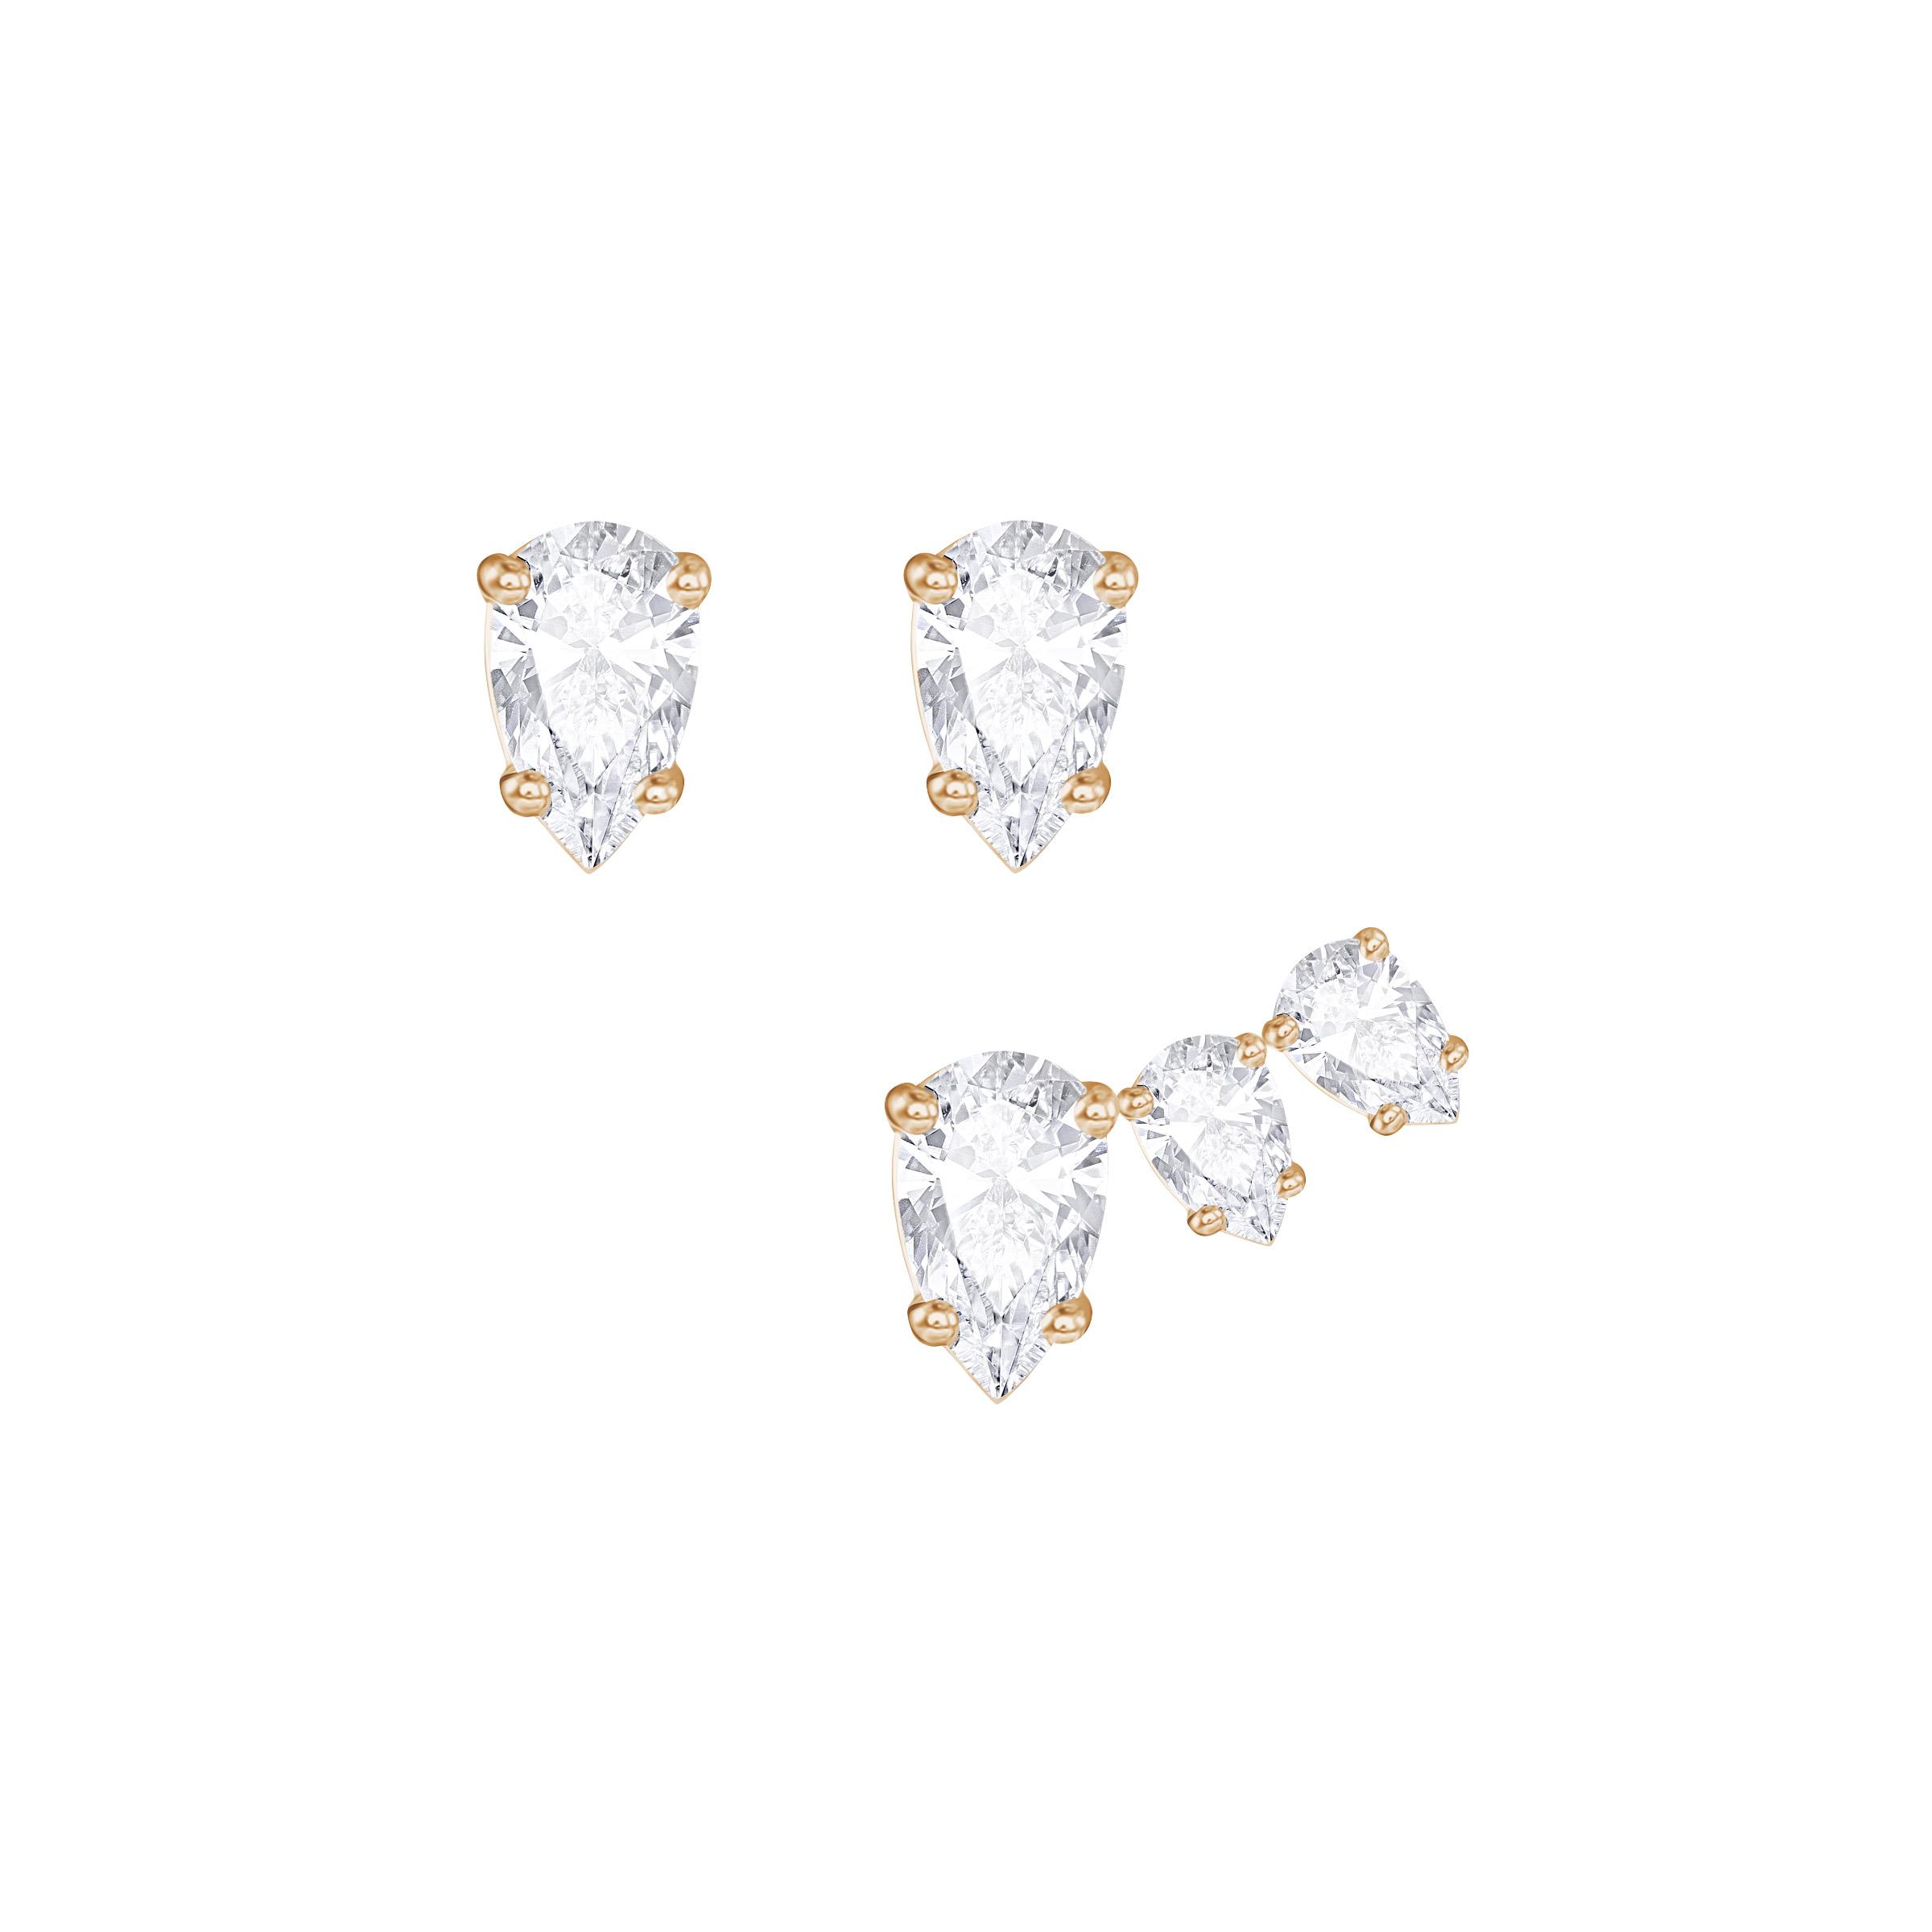 Boucles d'oreilles Swarovski Attract Pear, Blanc, métal rhodié ton rose